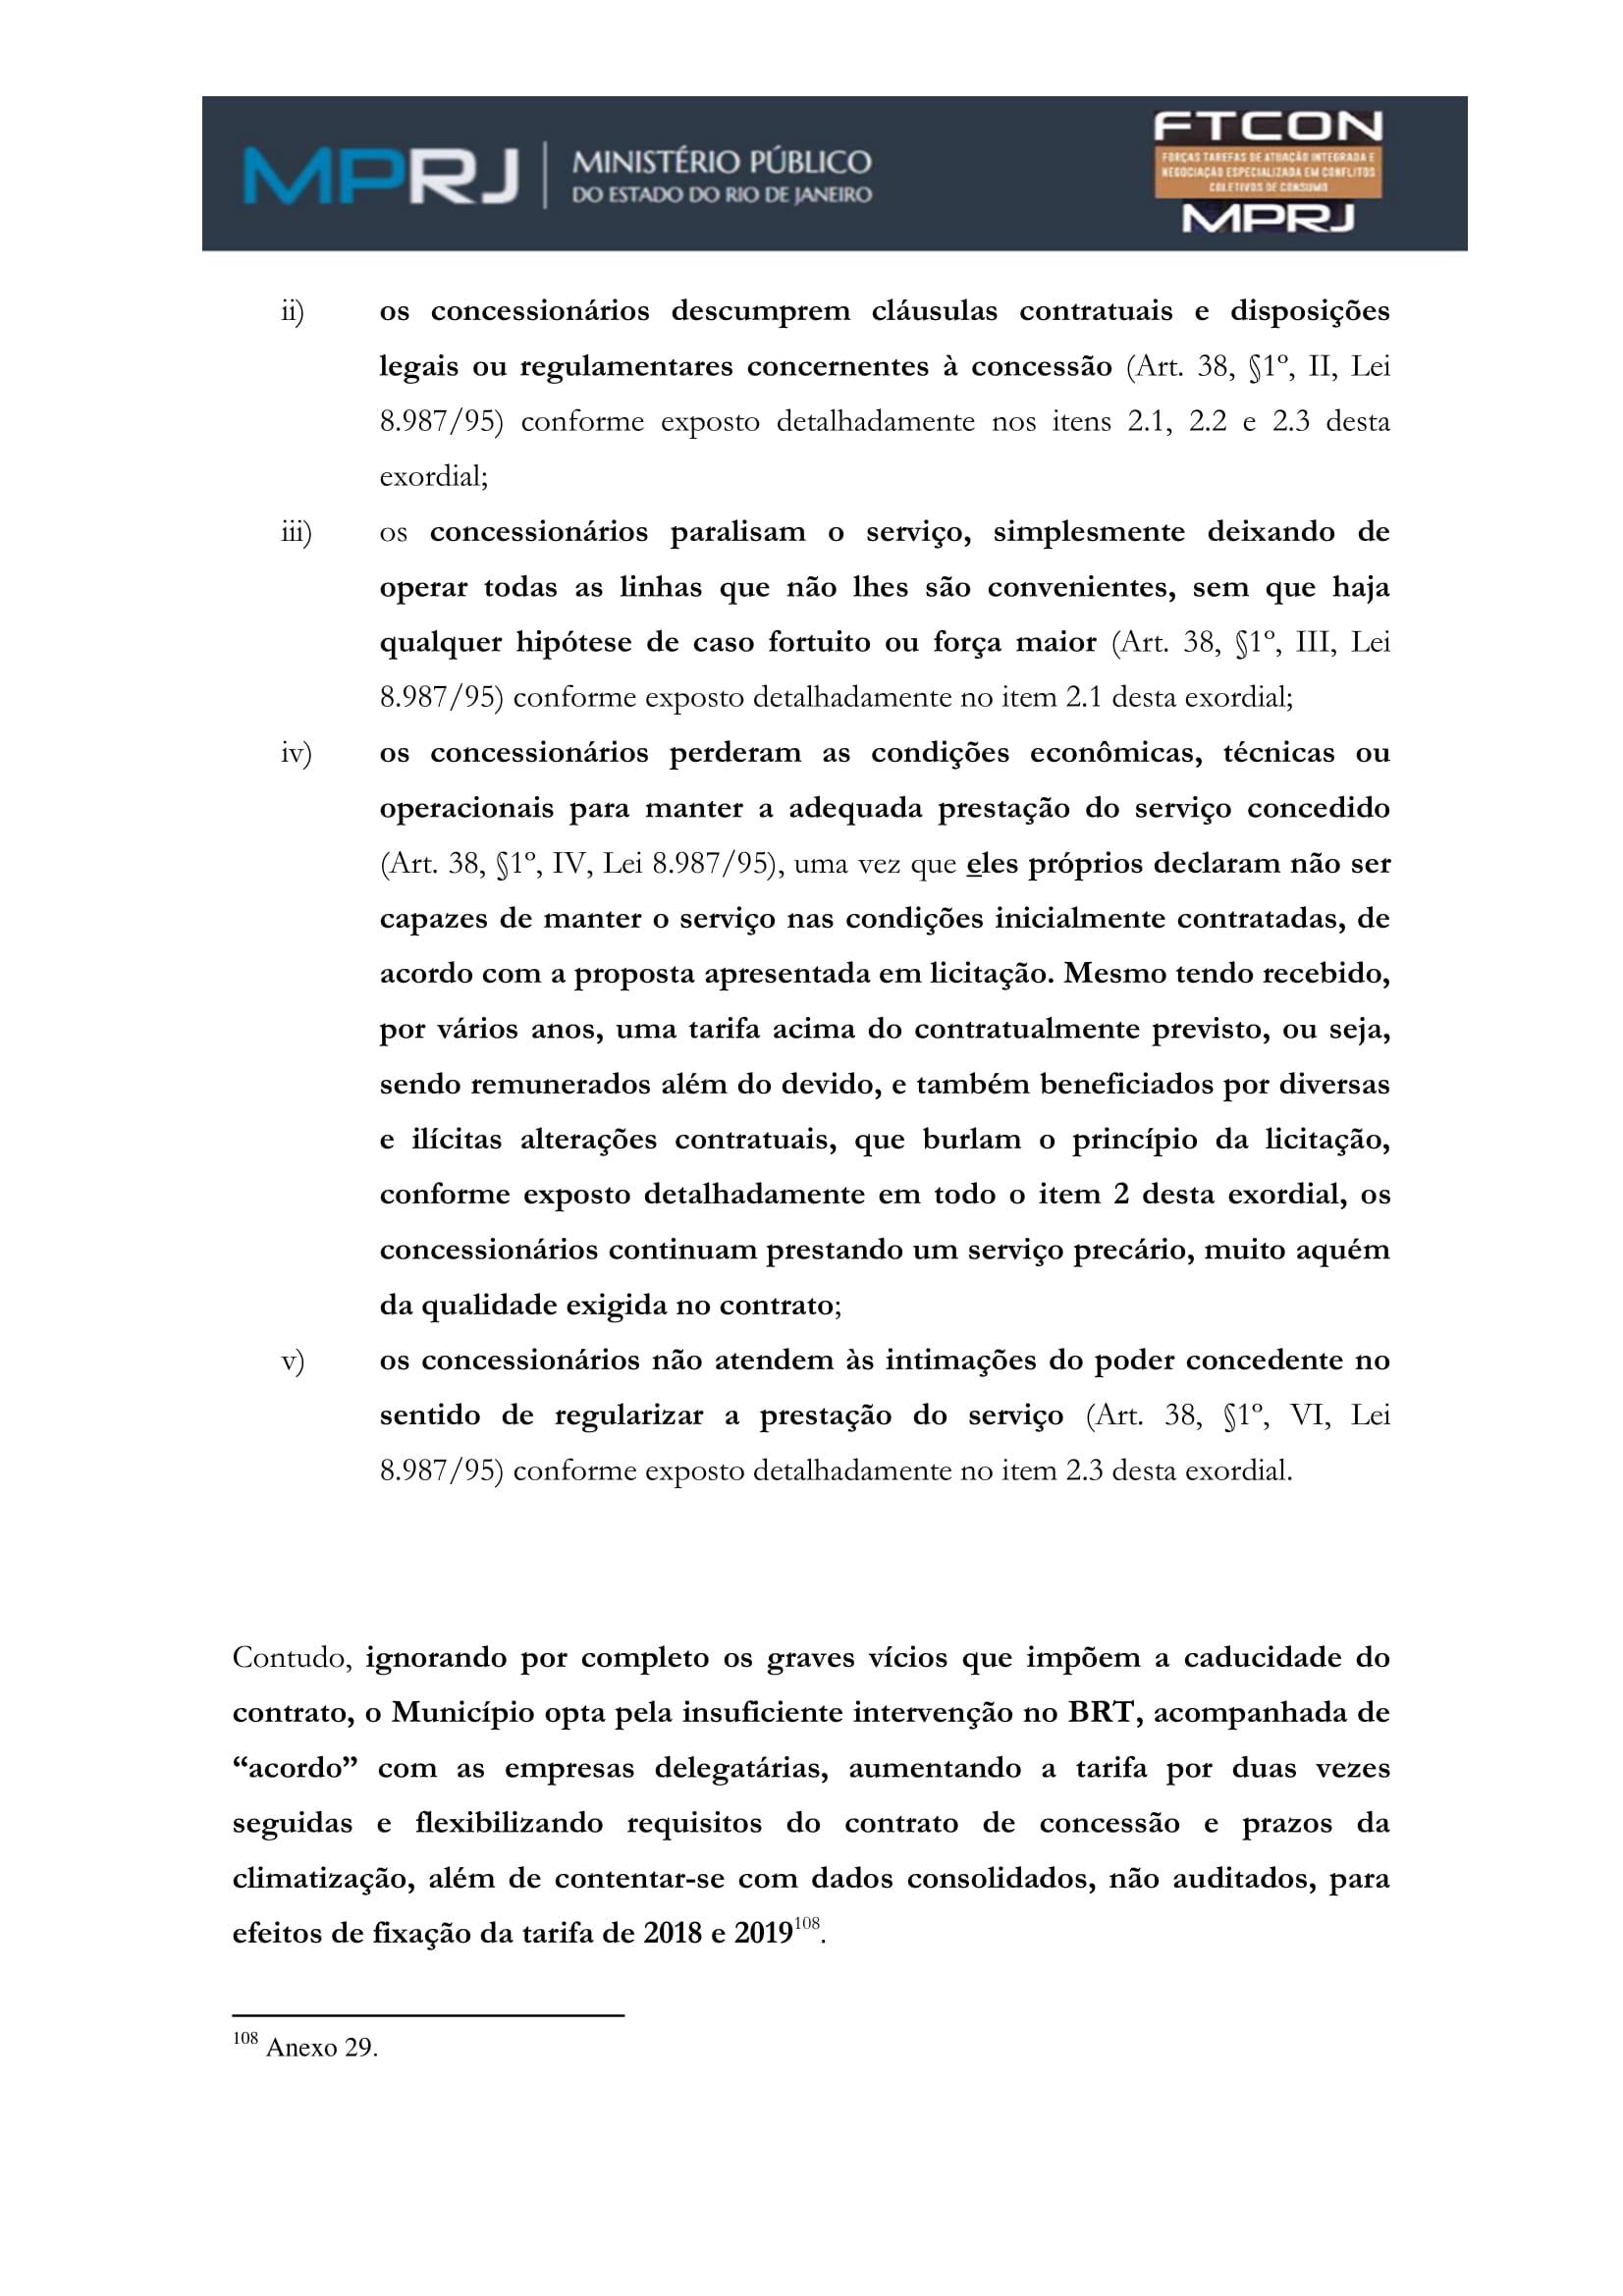 acp_caducidade_onibus_dr_rt-114